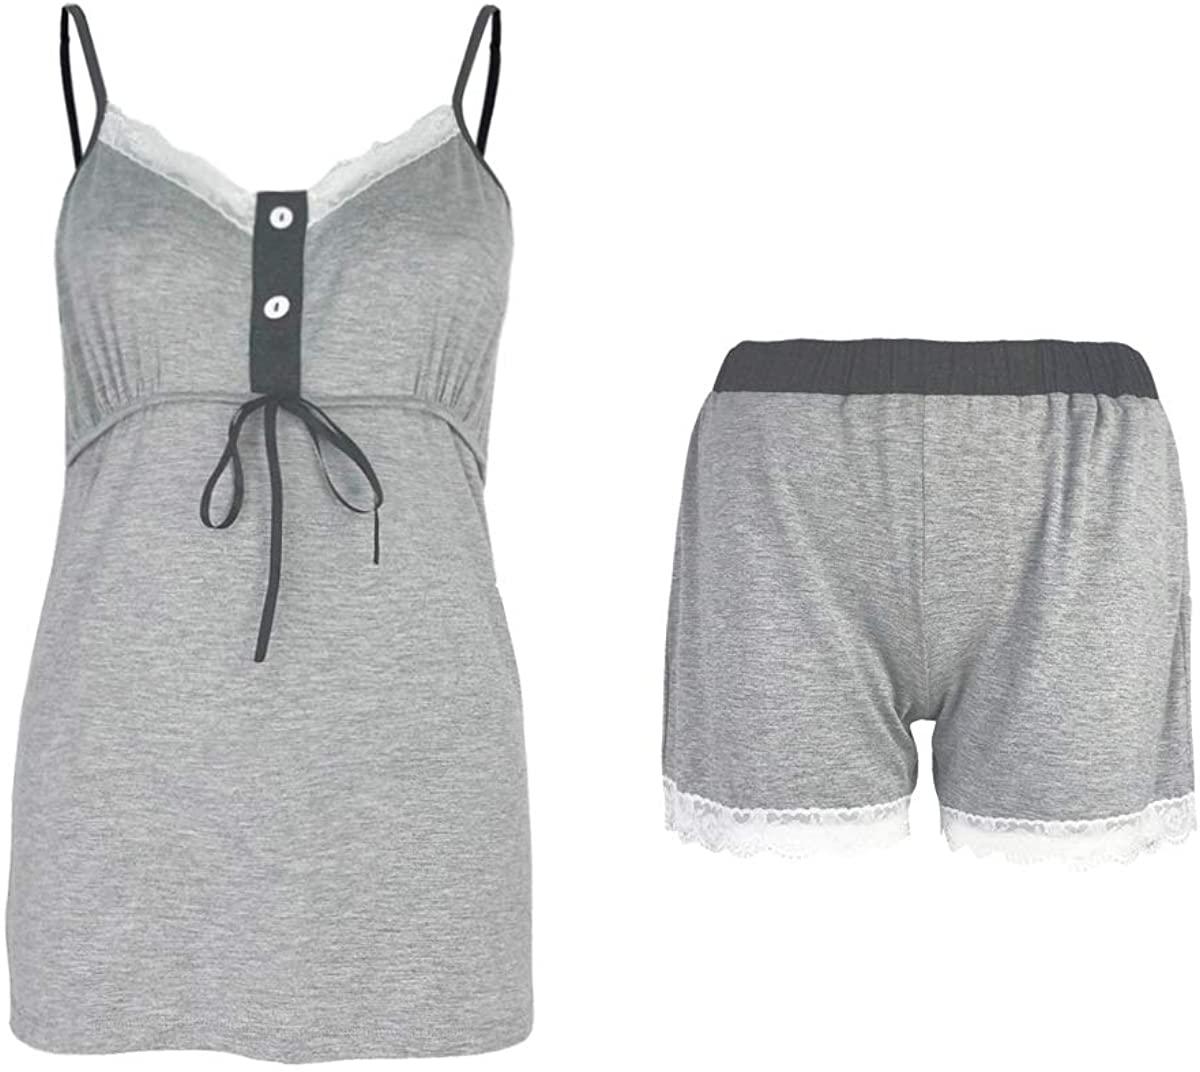 Sleepy Time Middle Rife Knot Women's Sleeve Less Bamboo Pajamas & Loungewear Set